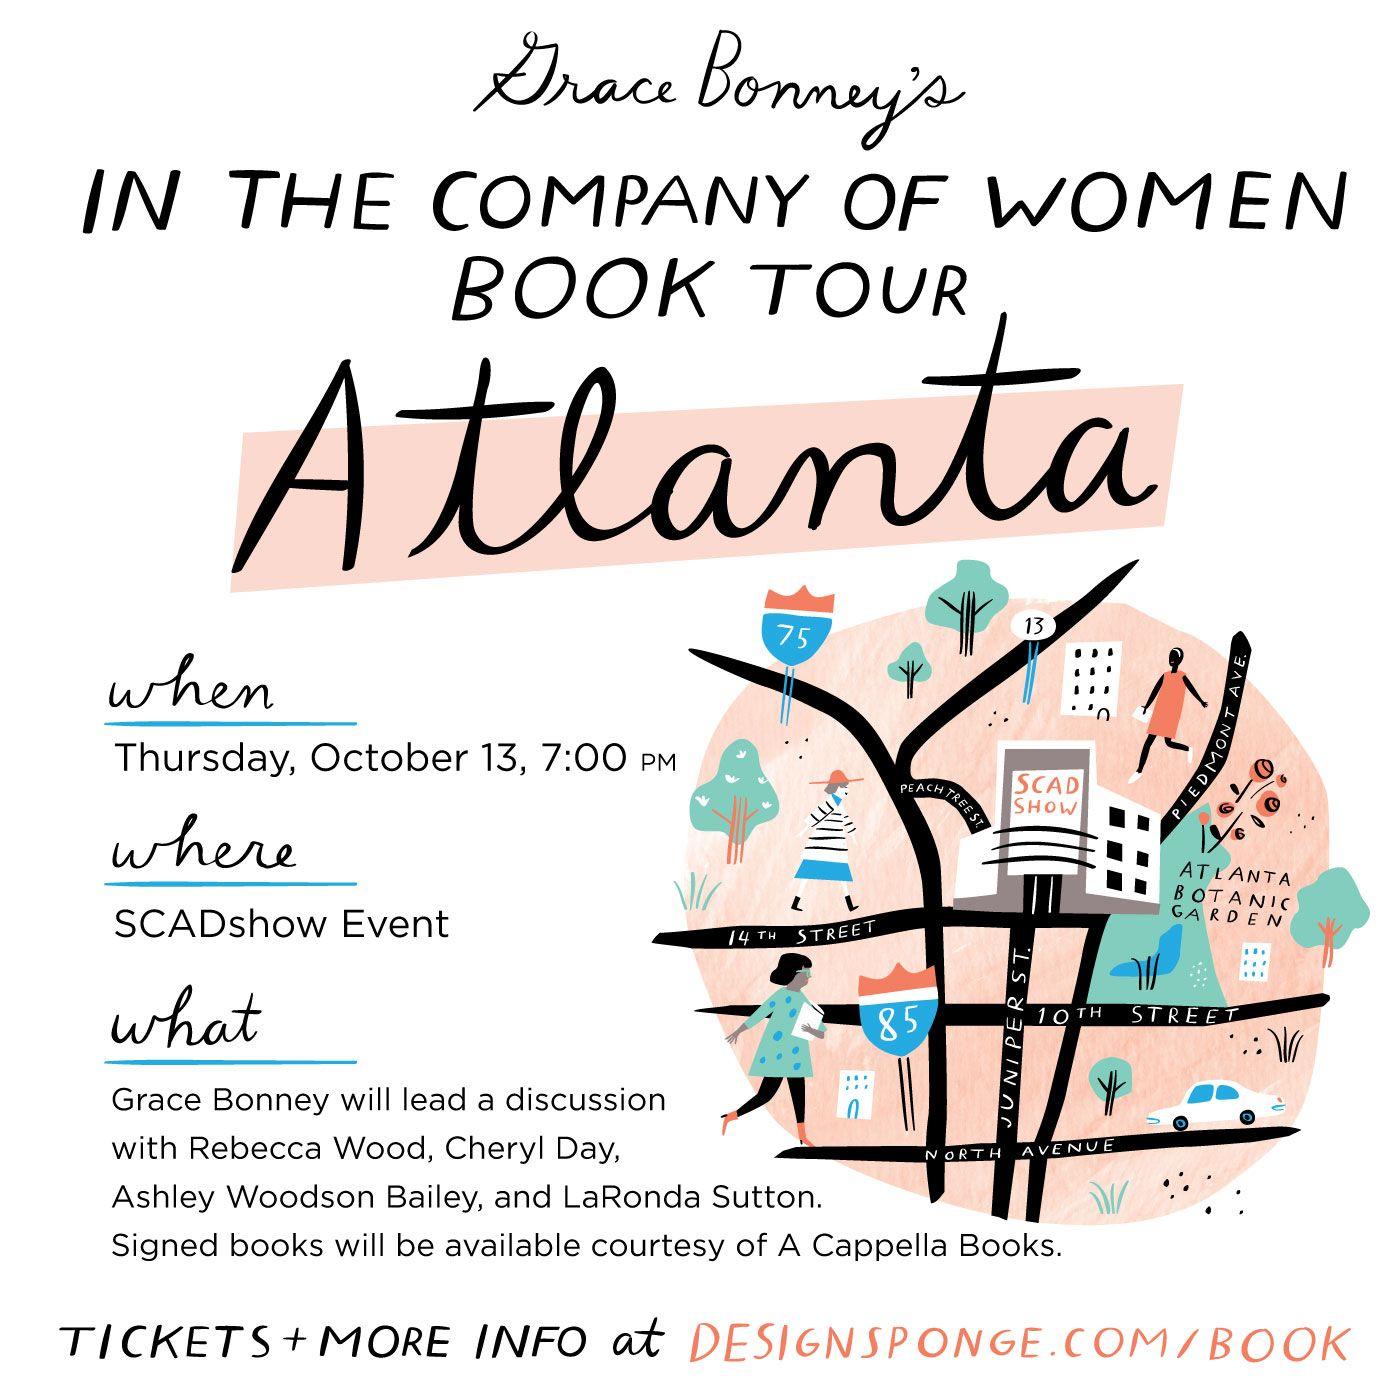 Book Tour: ATLANTA!